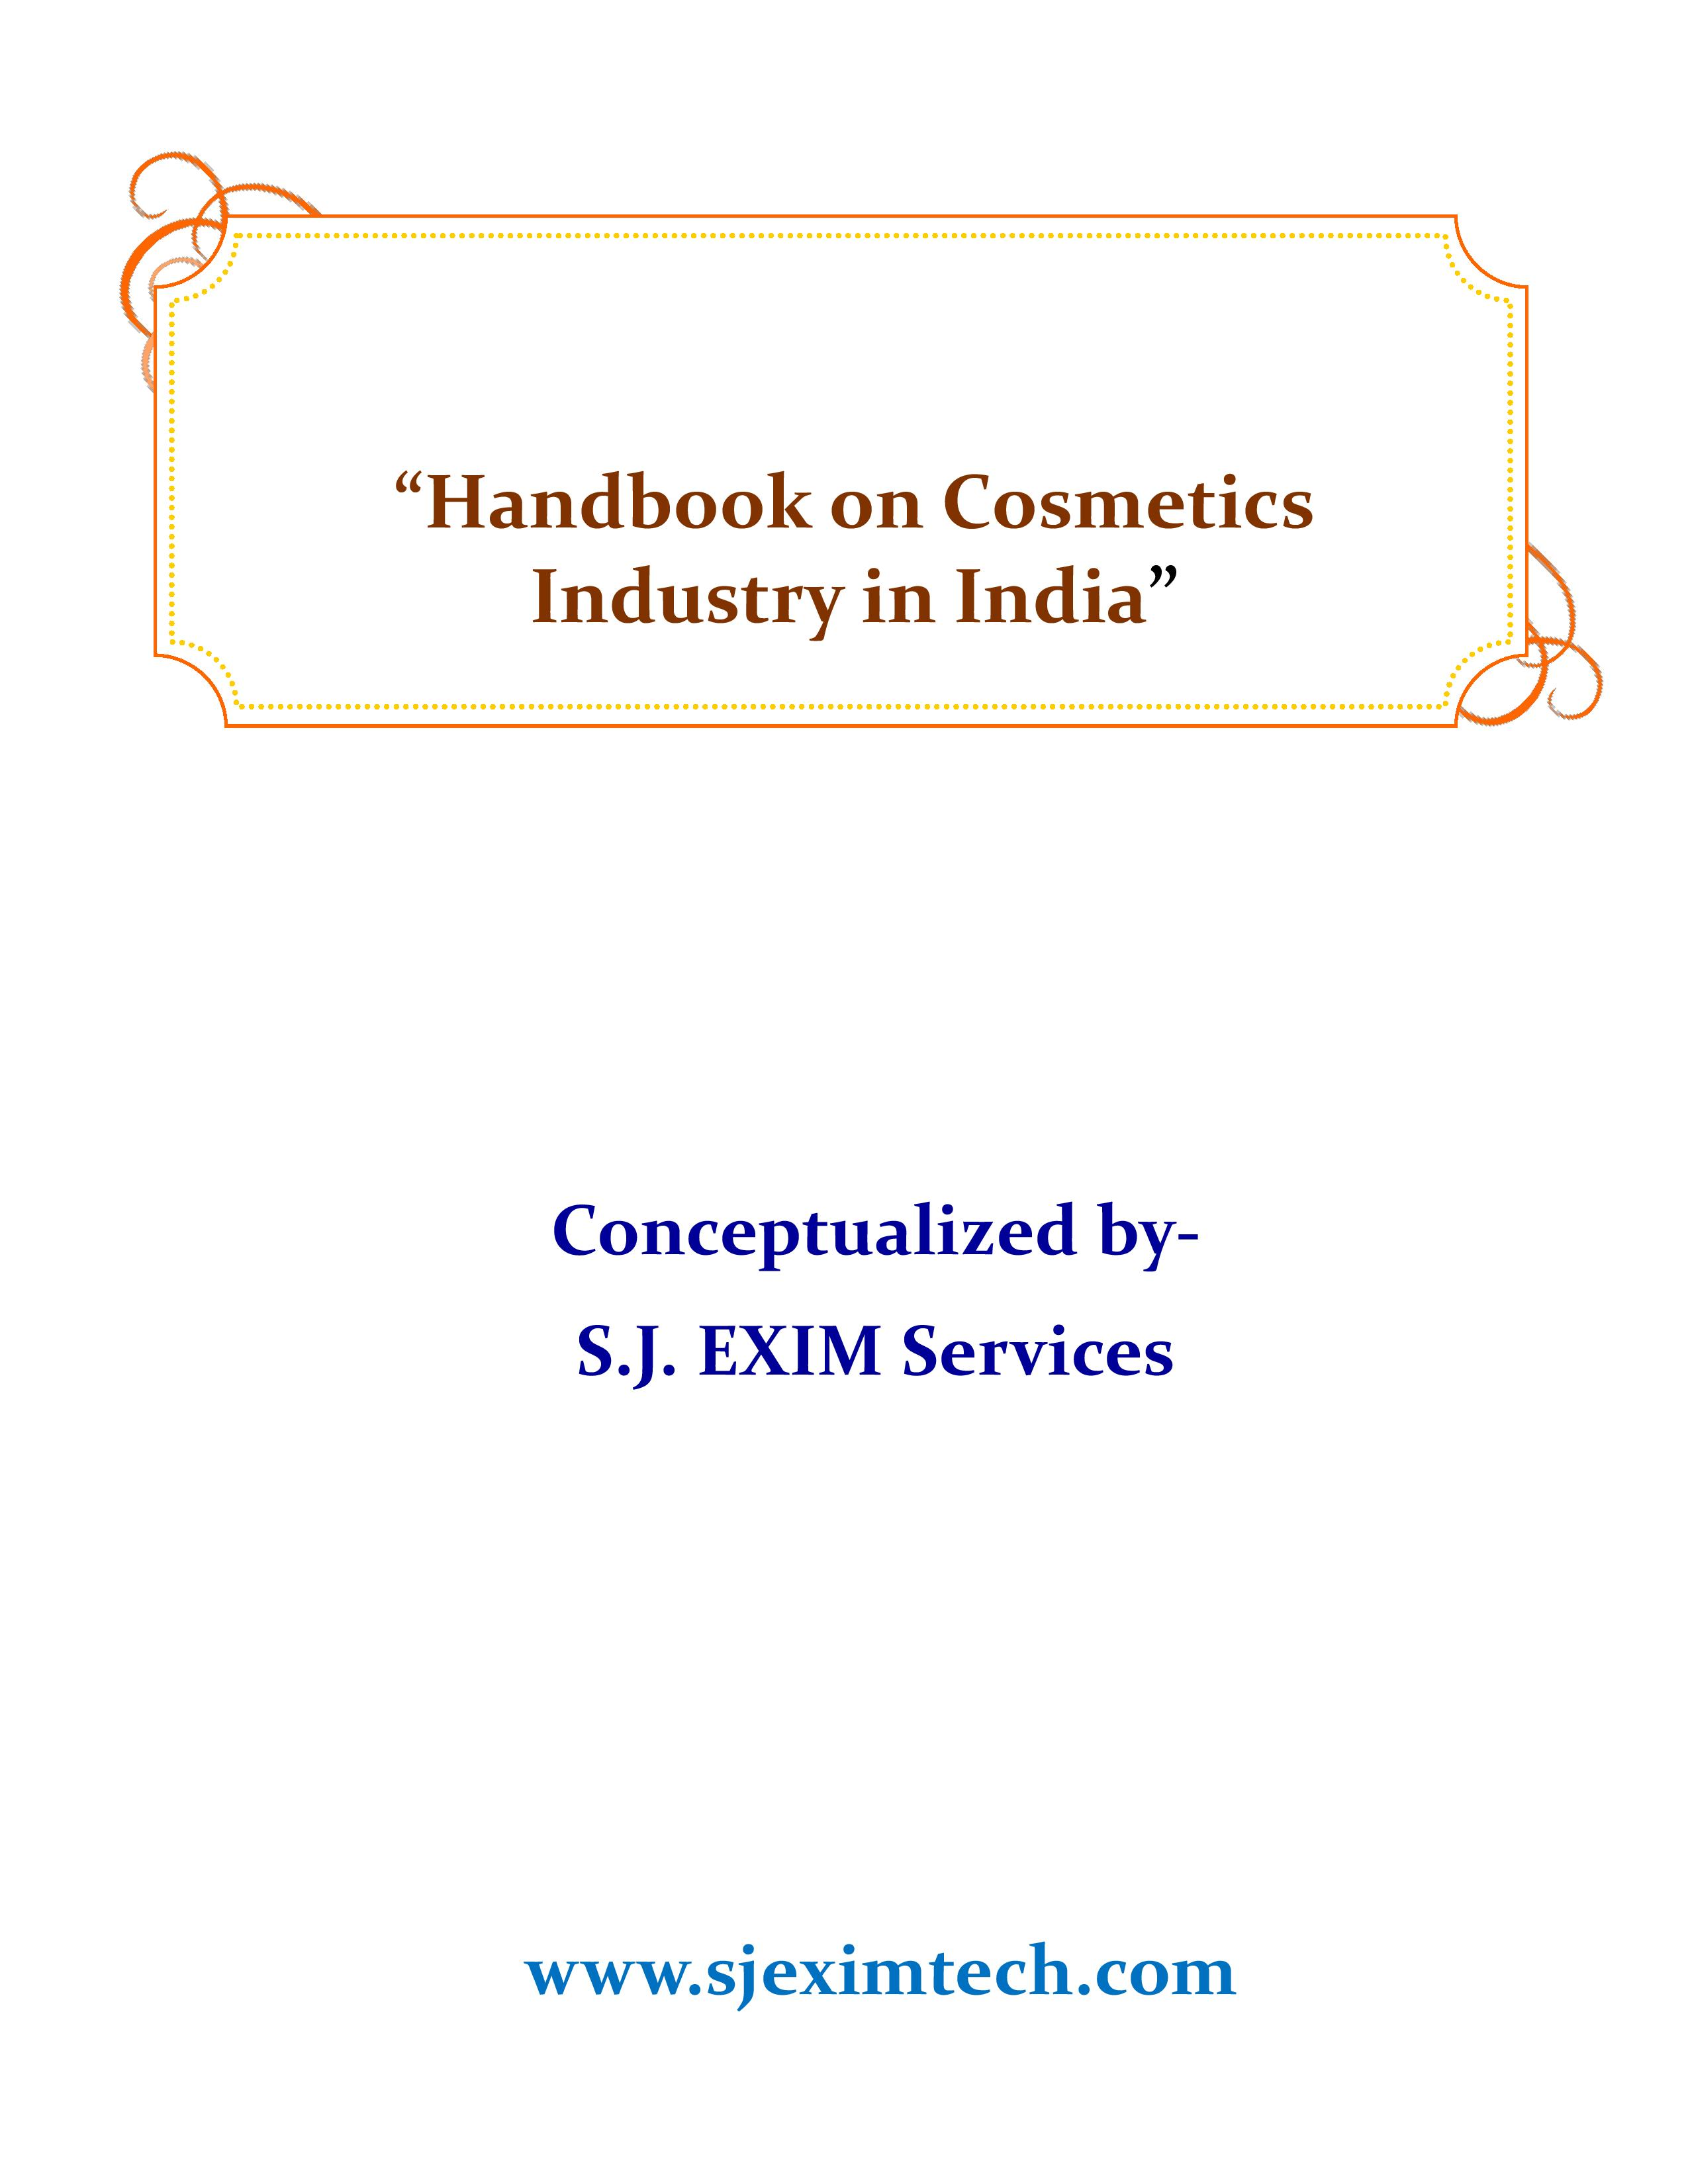 Handbook on Cosmetics Industry in India